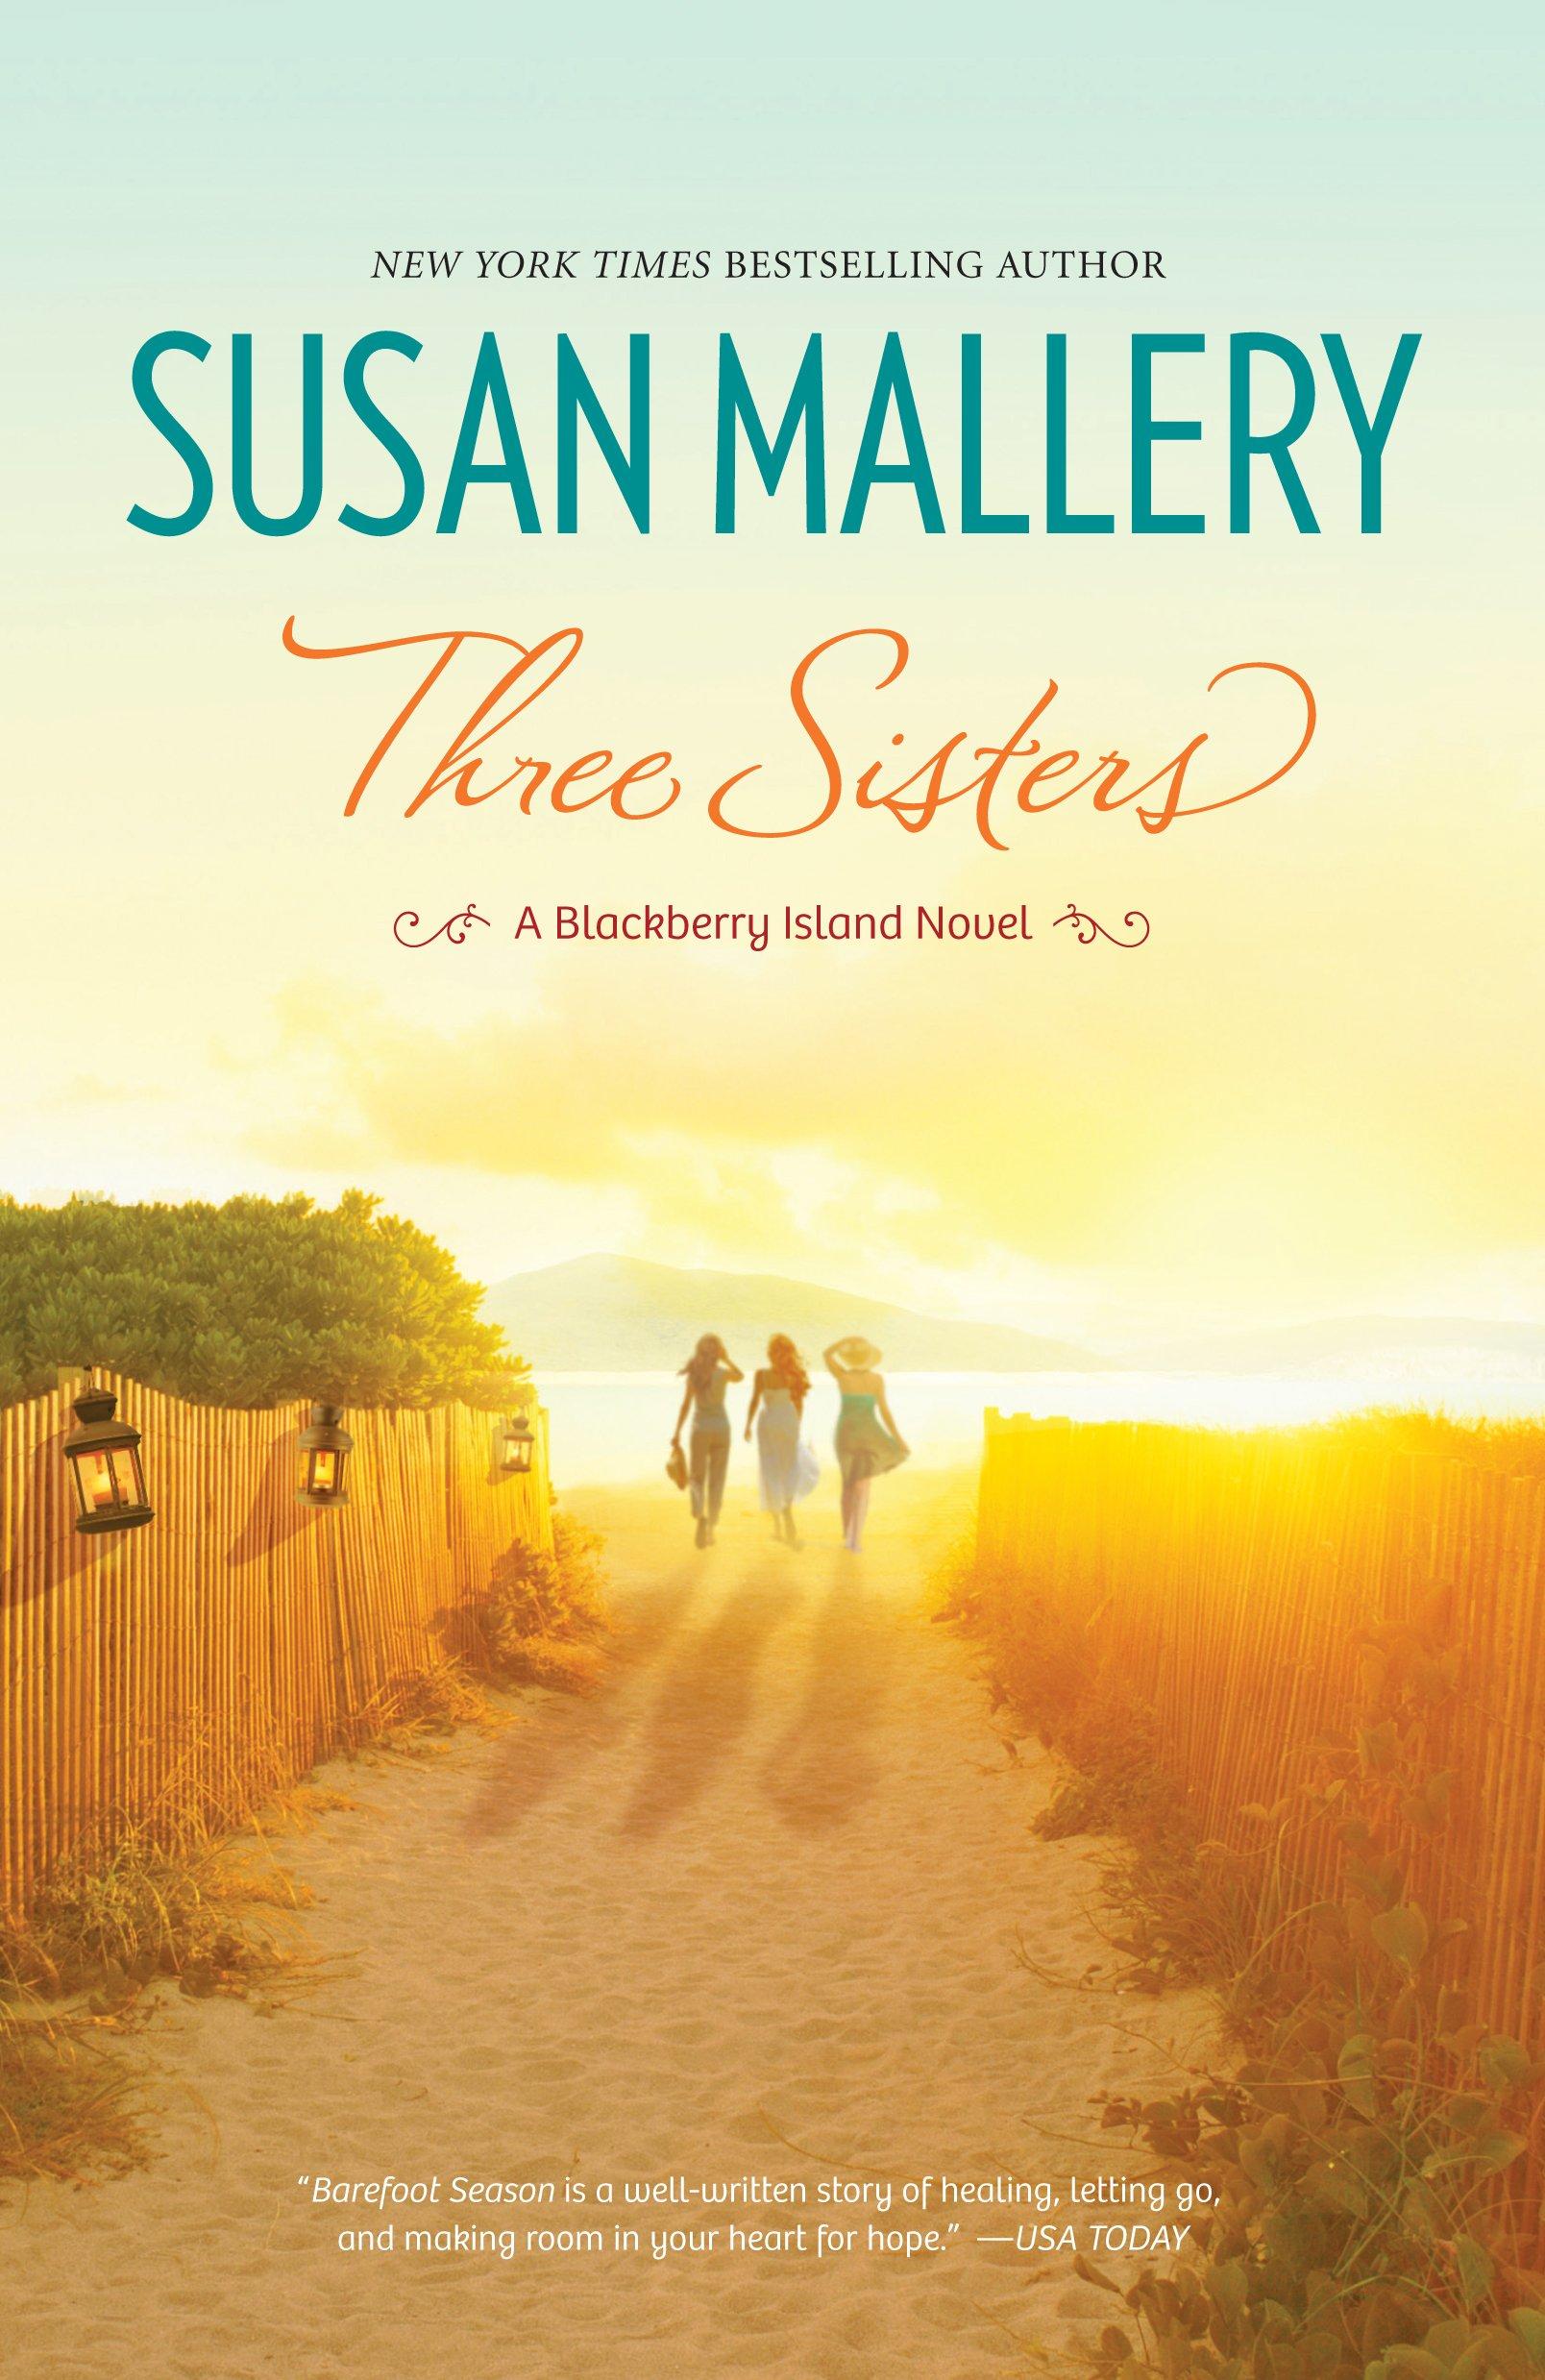 Three Sisters (A Blackberry Island Novel): Susan Mallery: 9781410455895:  Amazon.com: Books